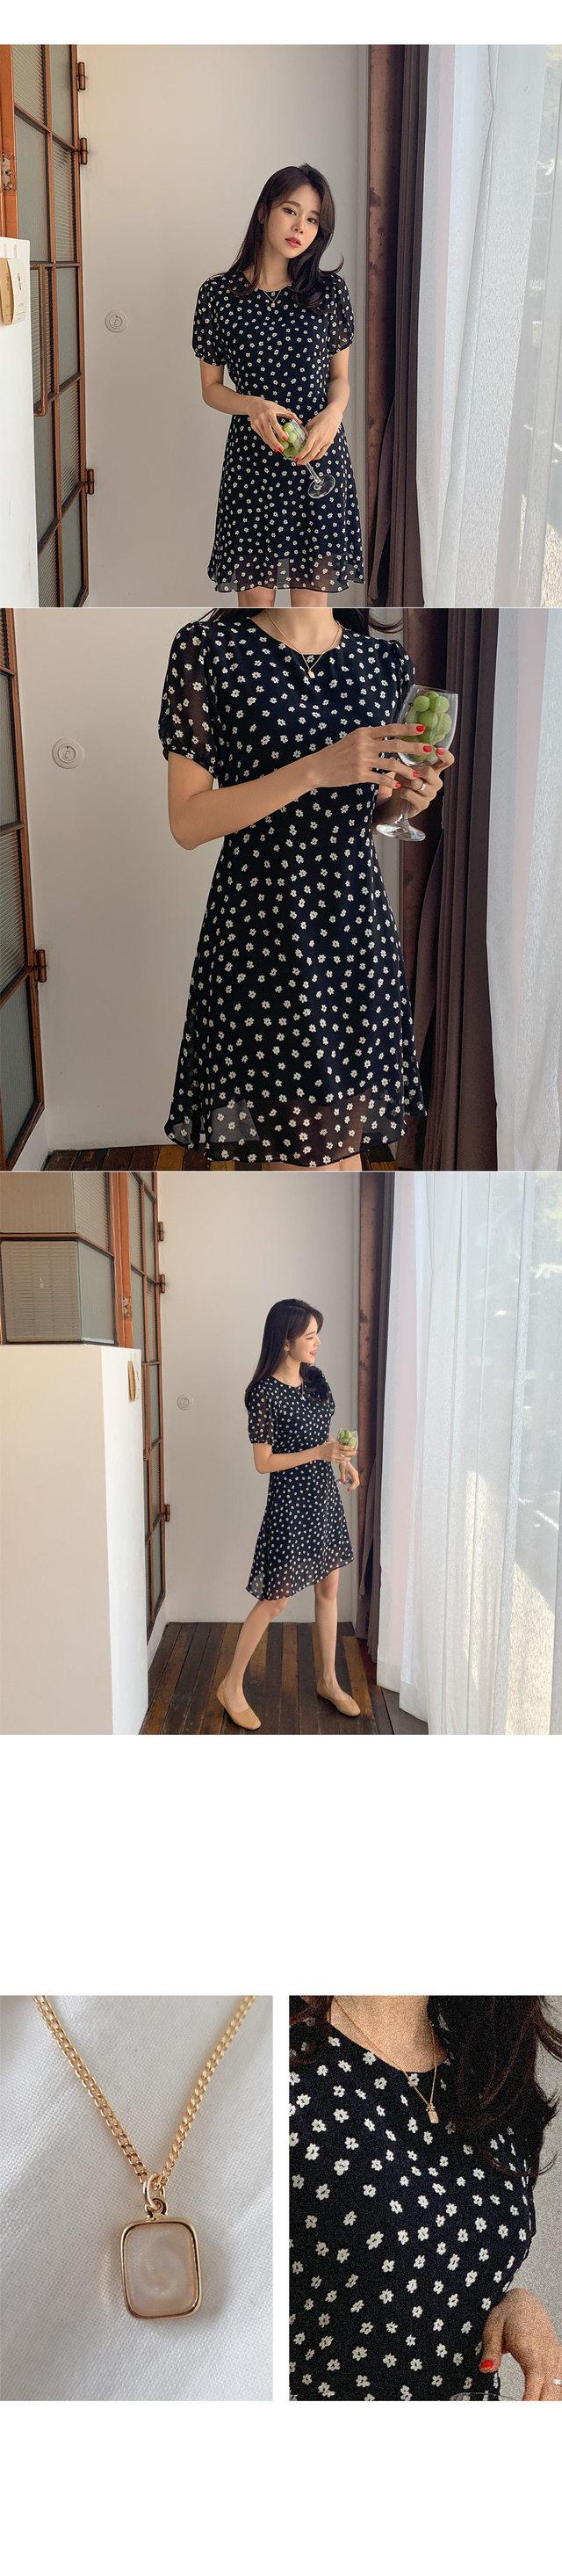 Oz flower dress